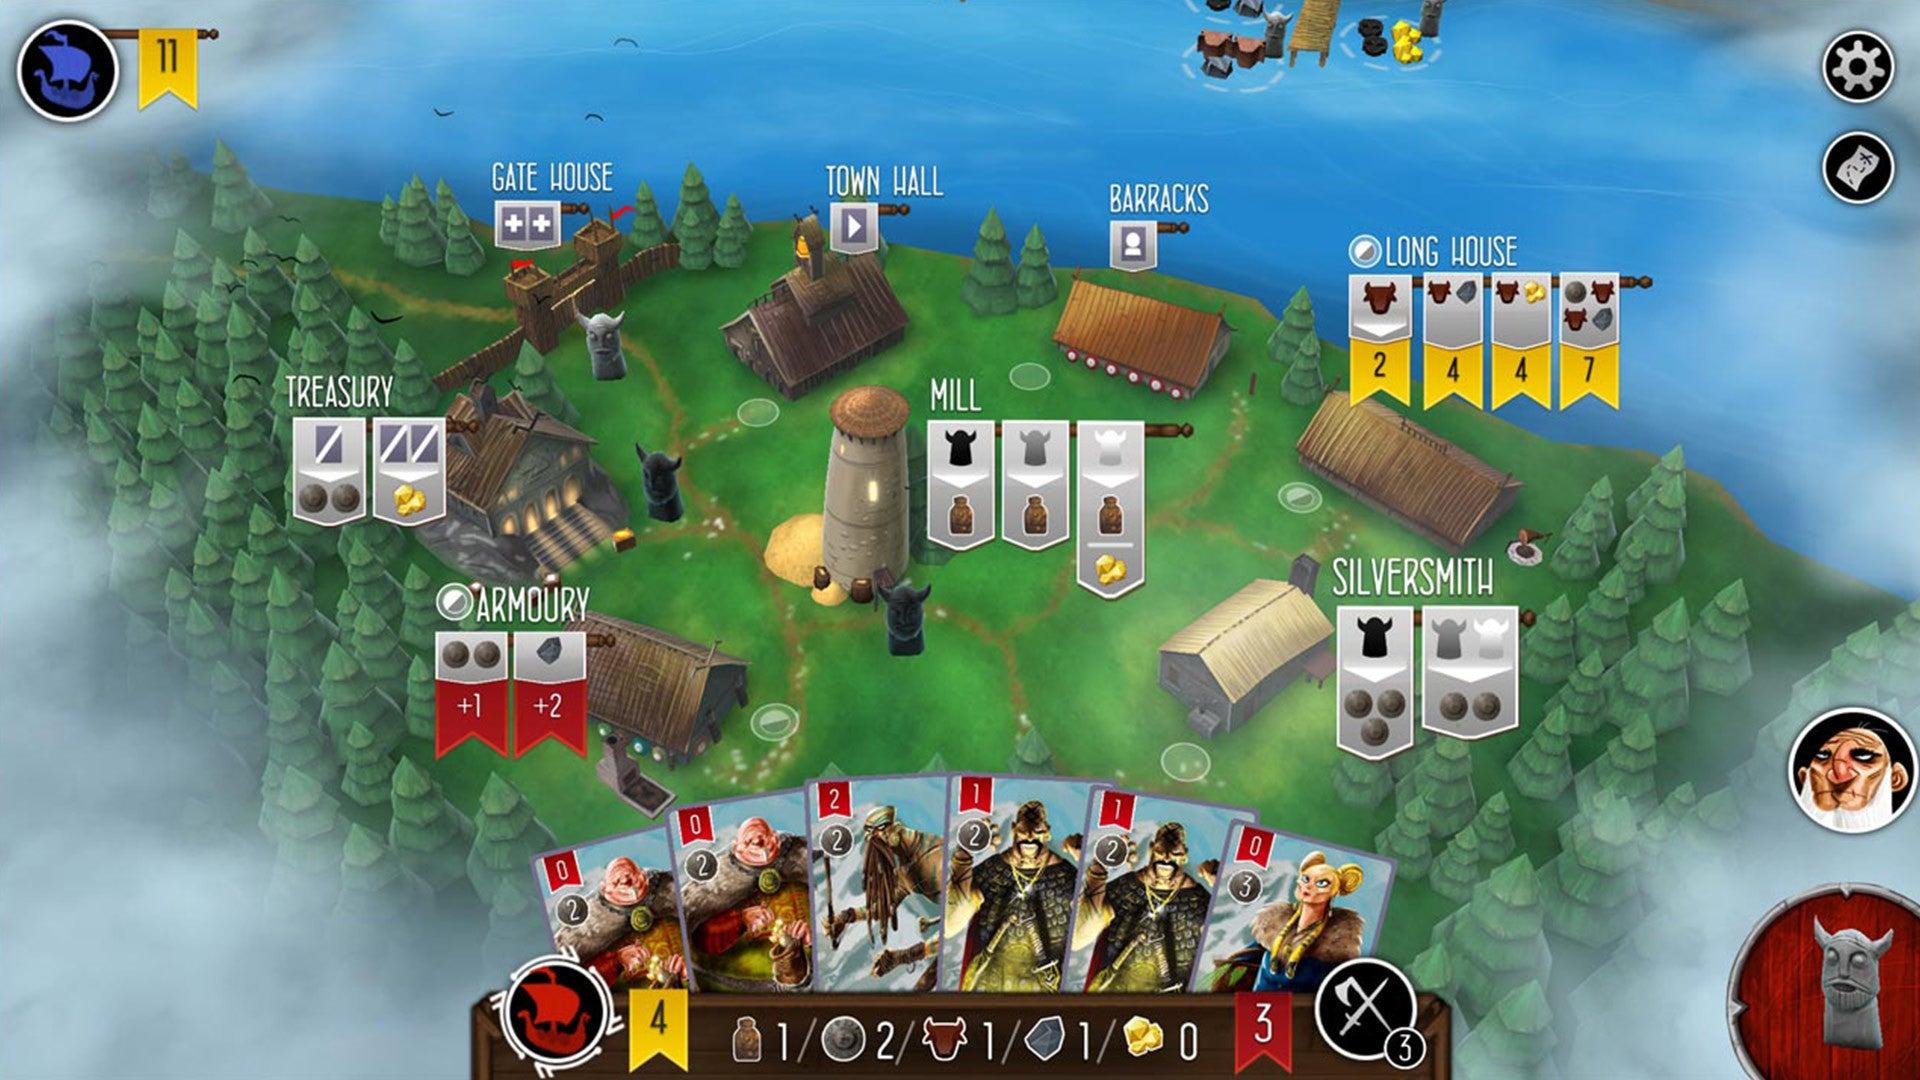 Raiders of the North Sea digital board game screenshot